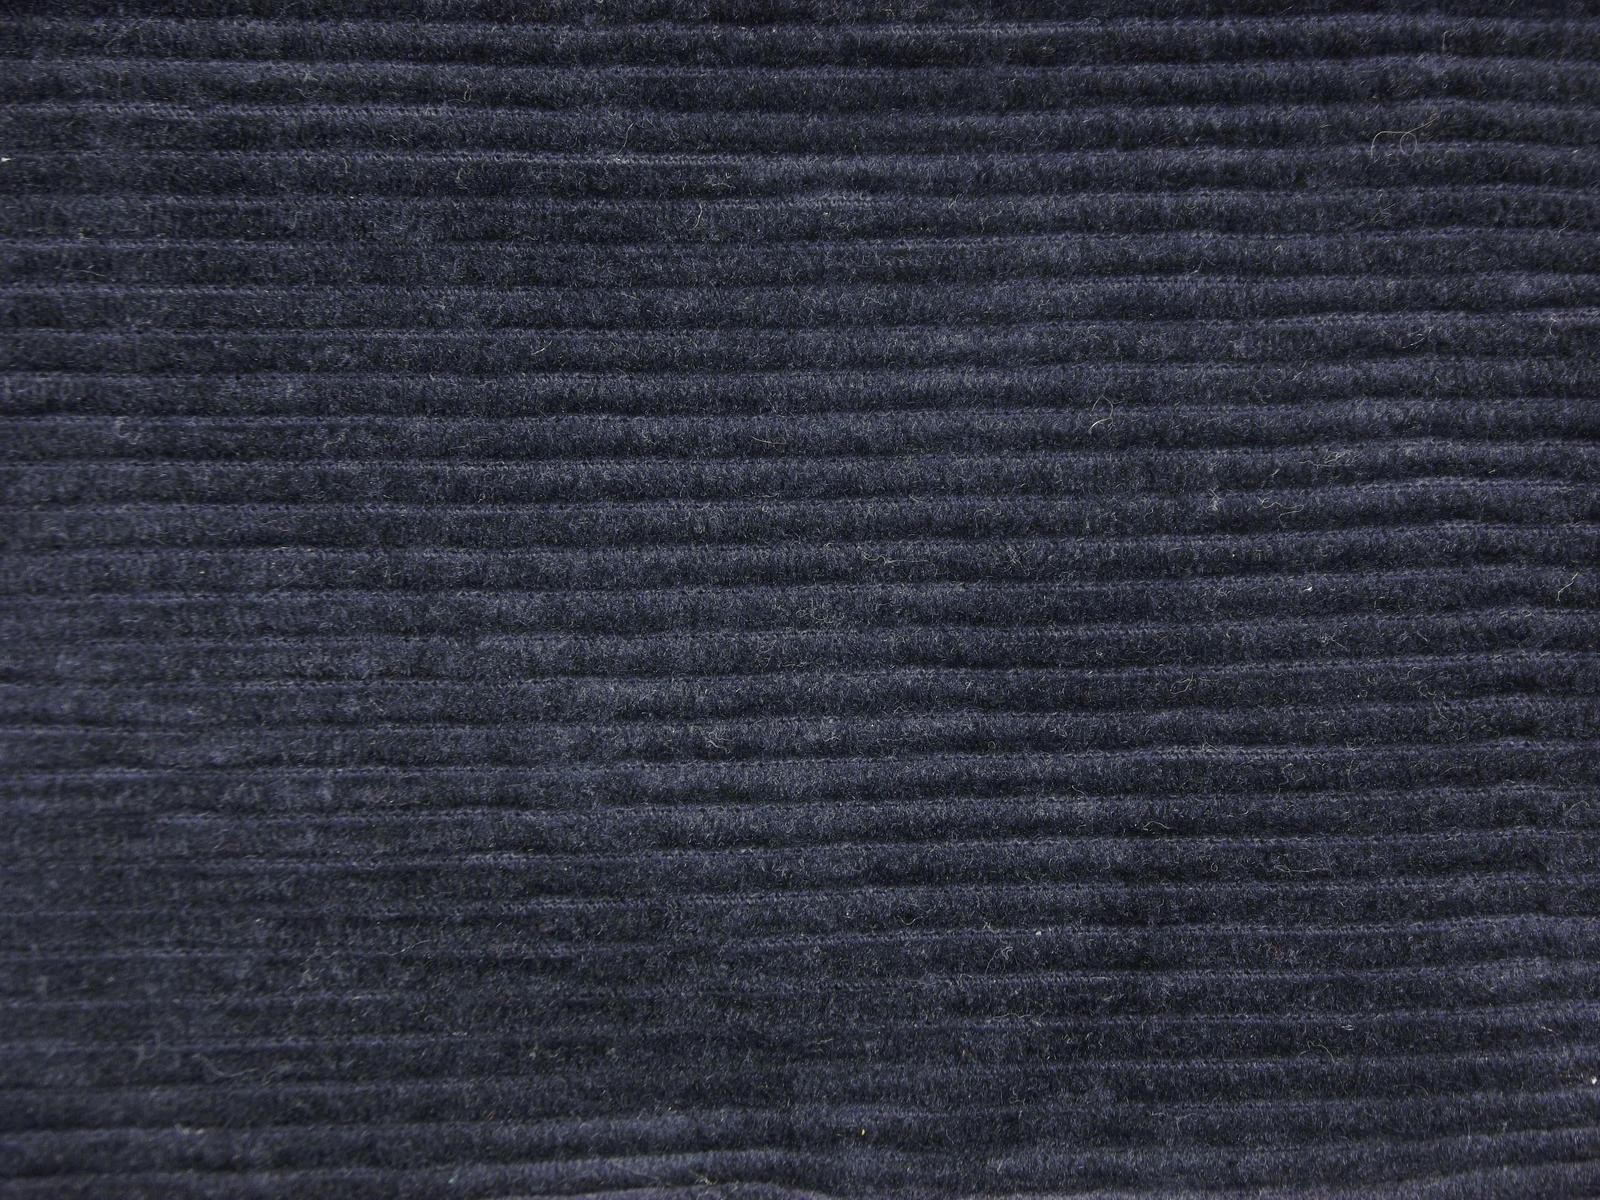 Dark Blue Corduroy Fabric by Adagem on DeviantArt